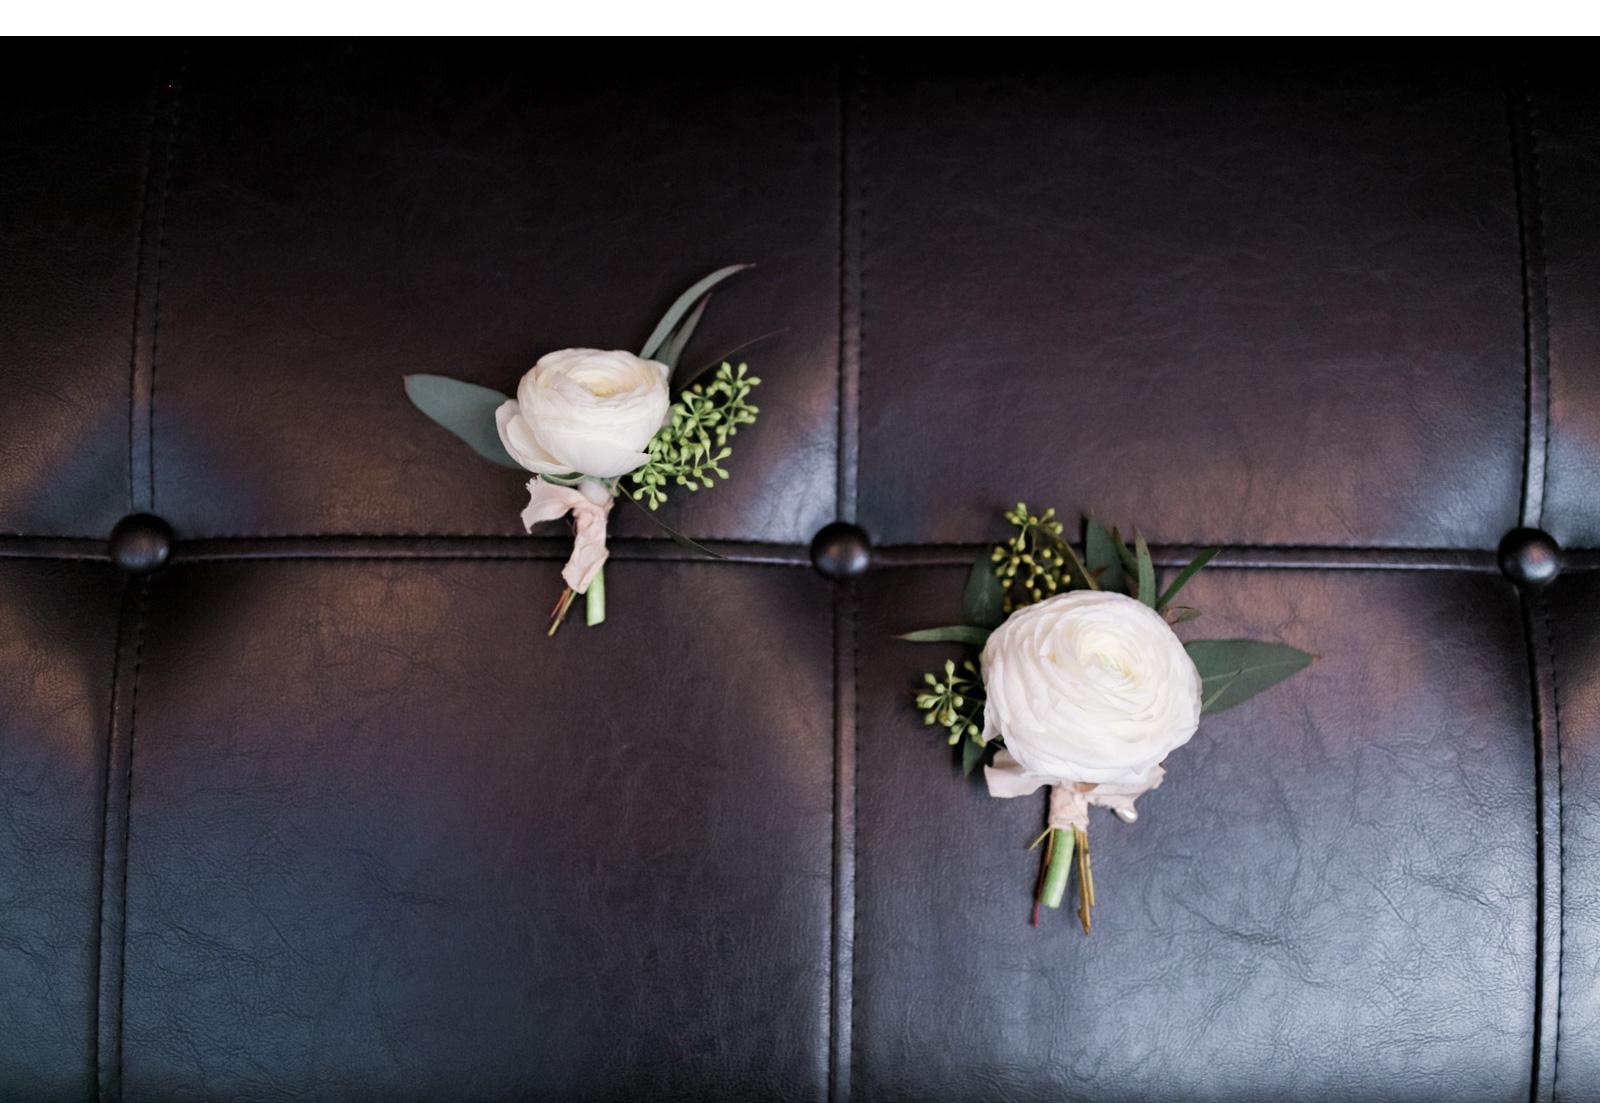 Los-Angeles-Wedding-Natalie-Schutt-Photography_02.jpg